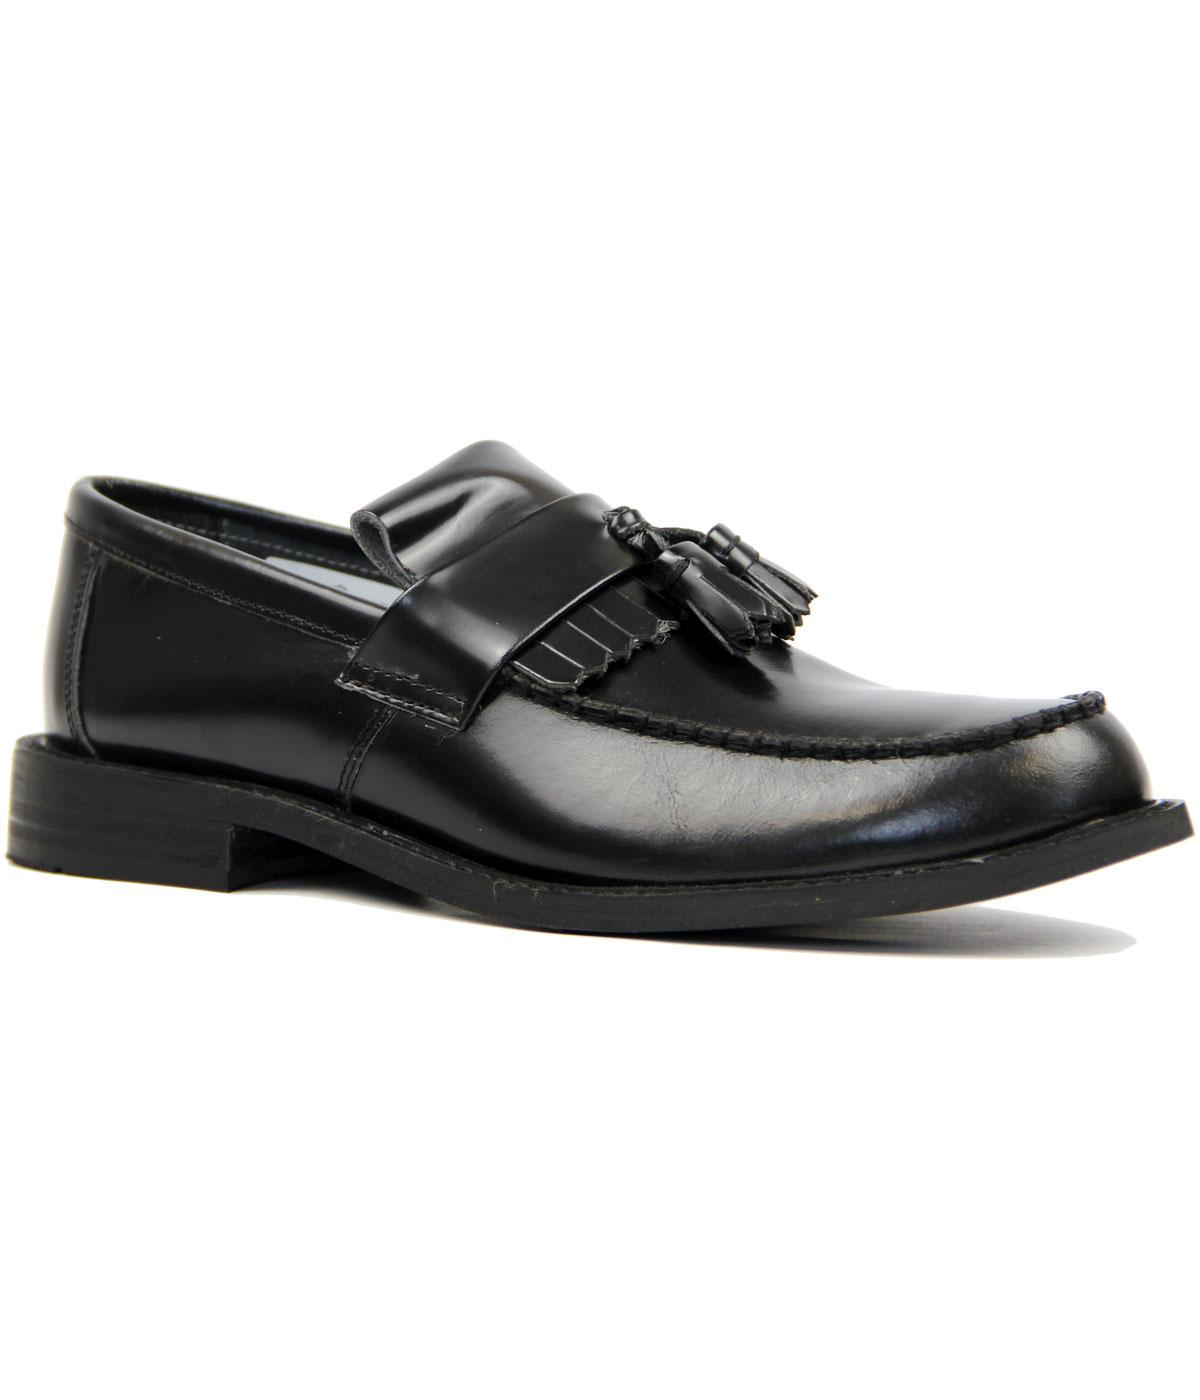 Retro Mod Tassel Fringe Leather Loafers (Black)